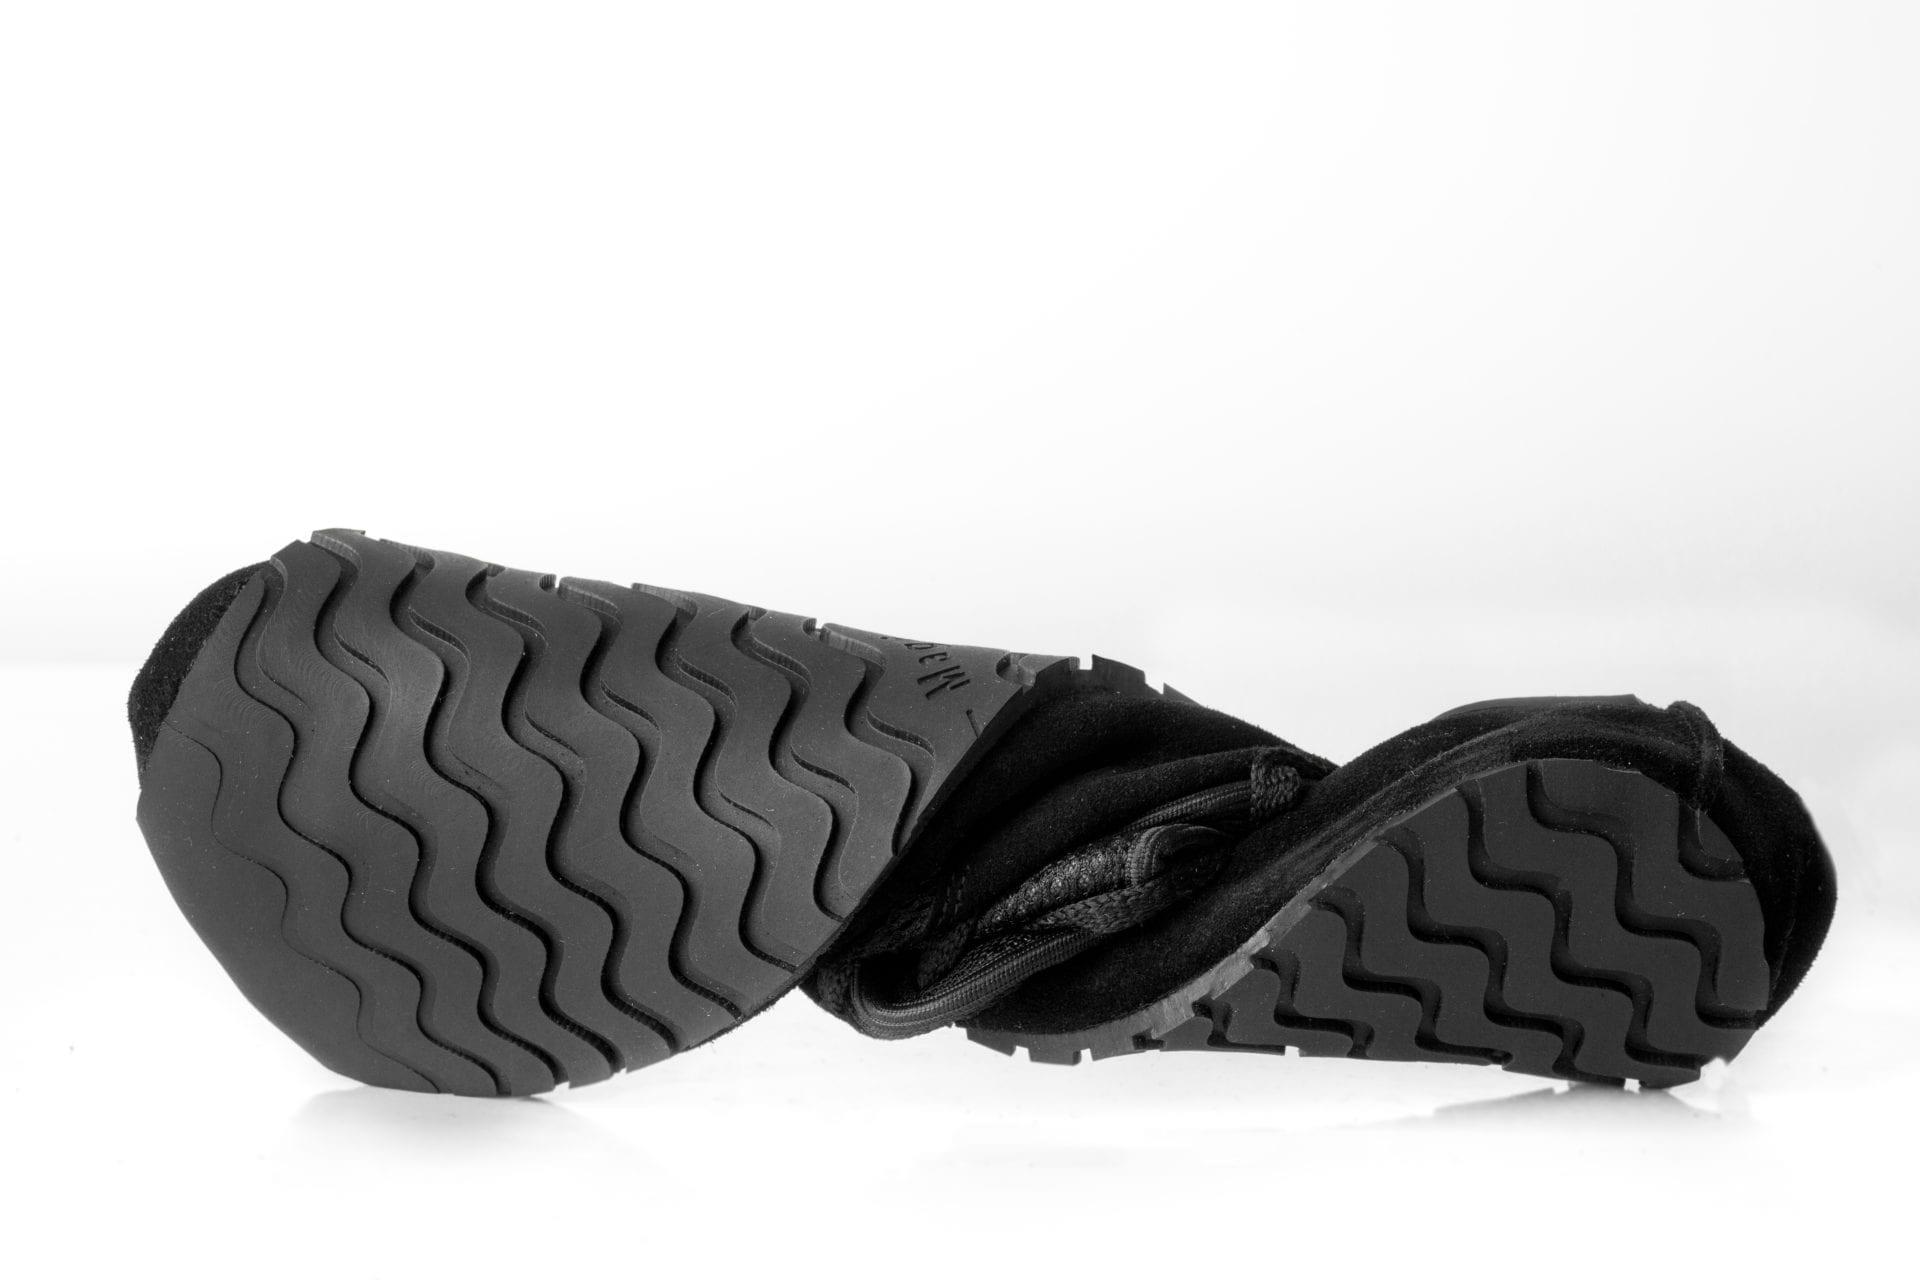 Magical Shoes BAREFOOT SHOES EXPLORER CLASSIC BLACK KIDS picture 5